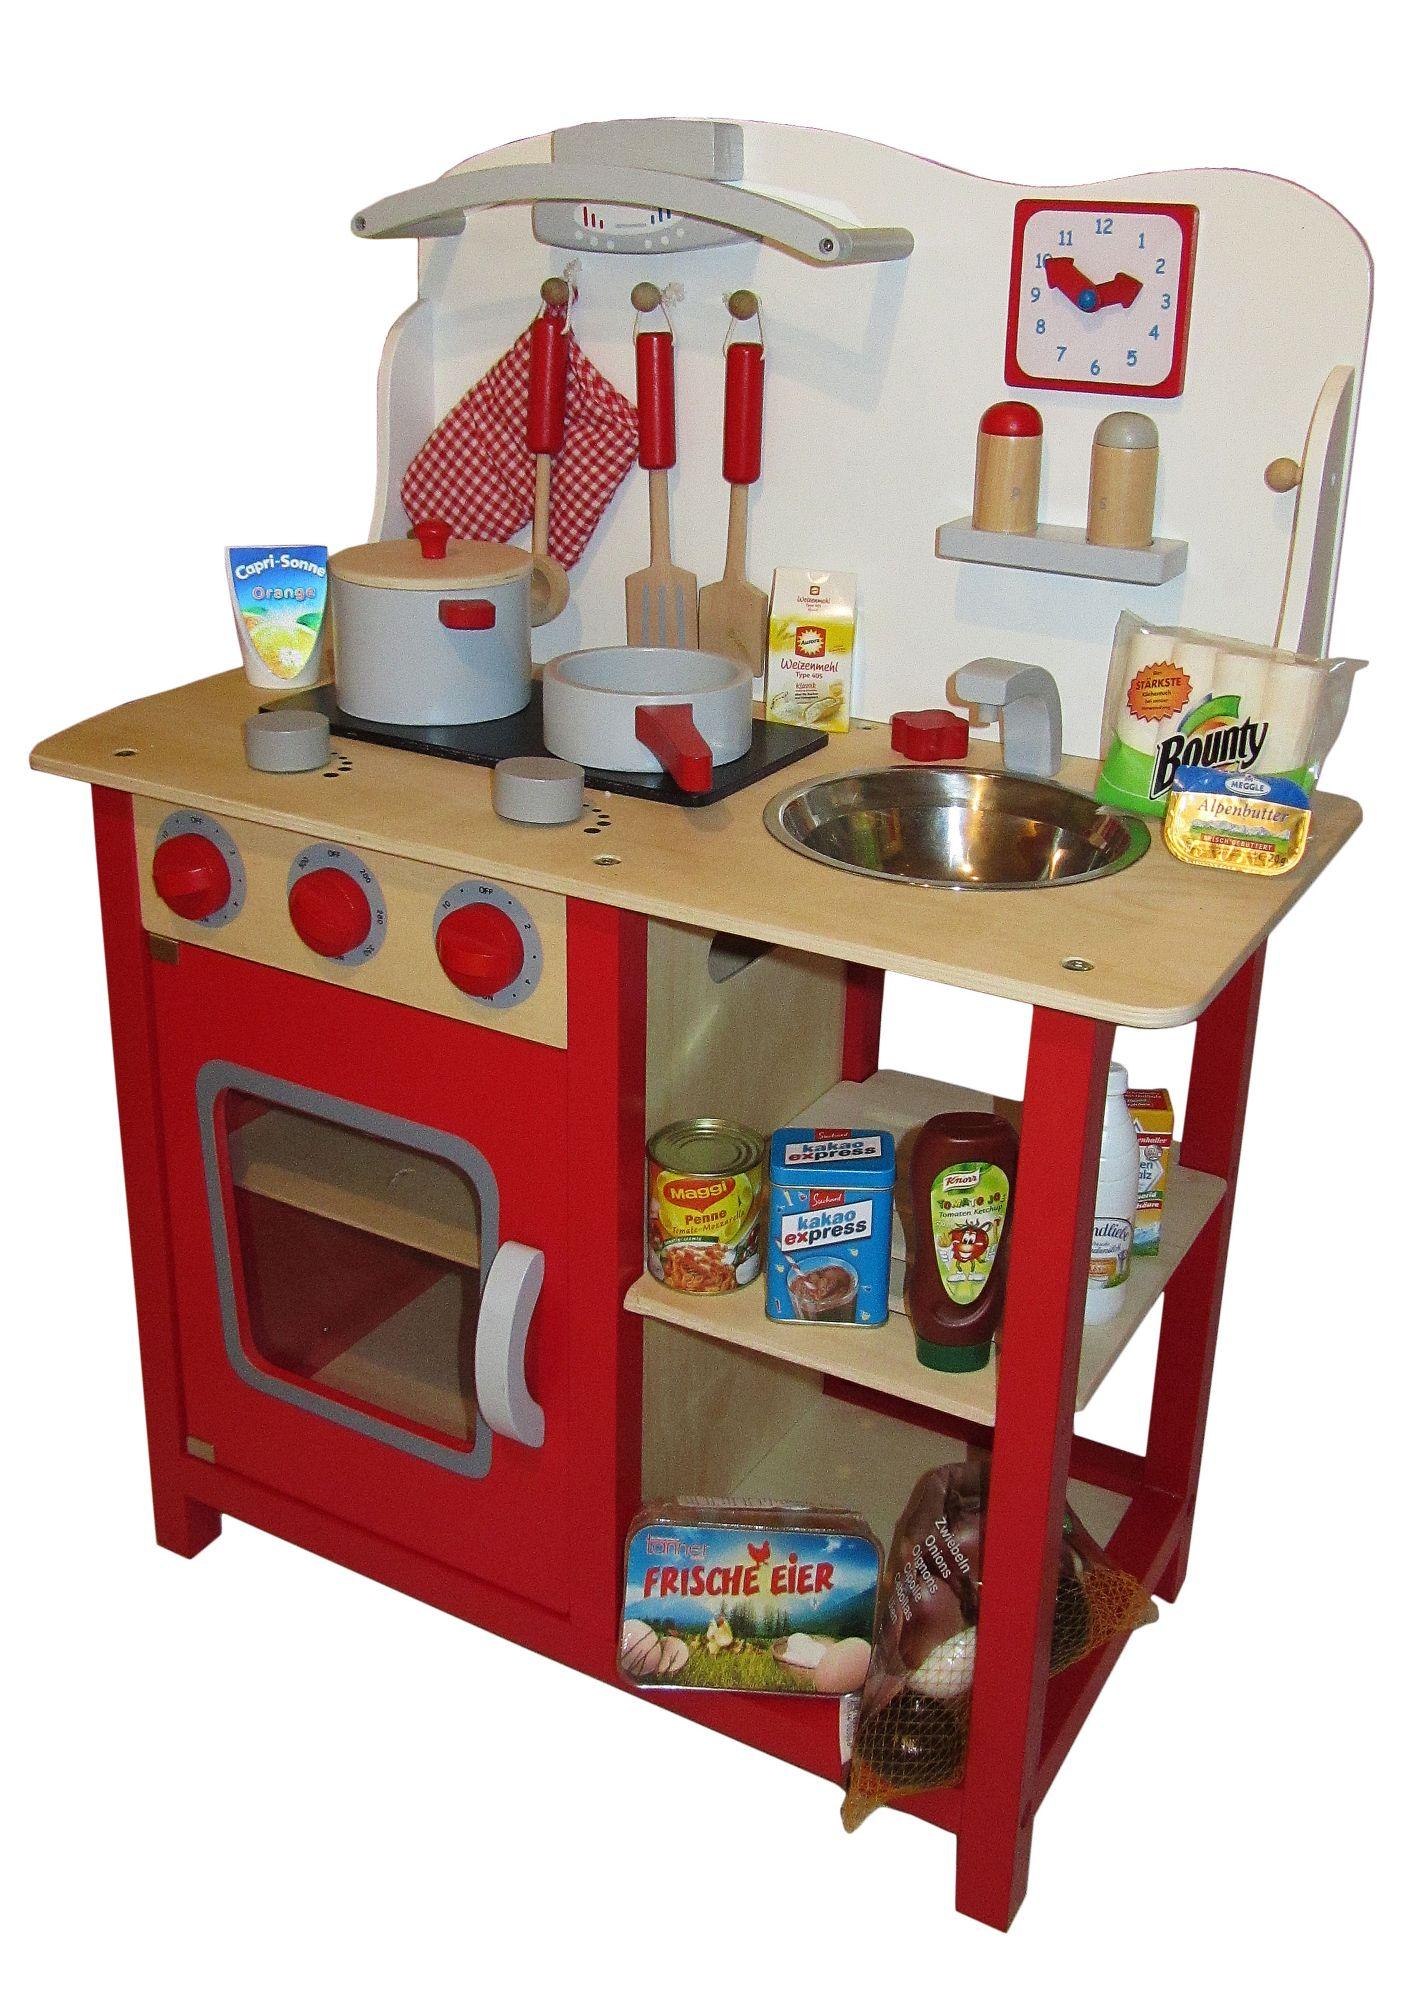 Kinderkueche spielkueche g nstig online kaufen beim schwab - Mini cucina per bambini ...